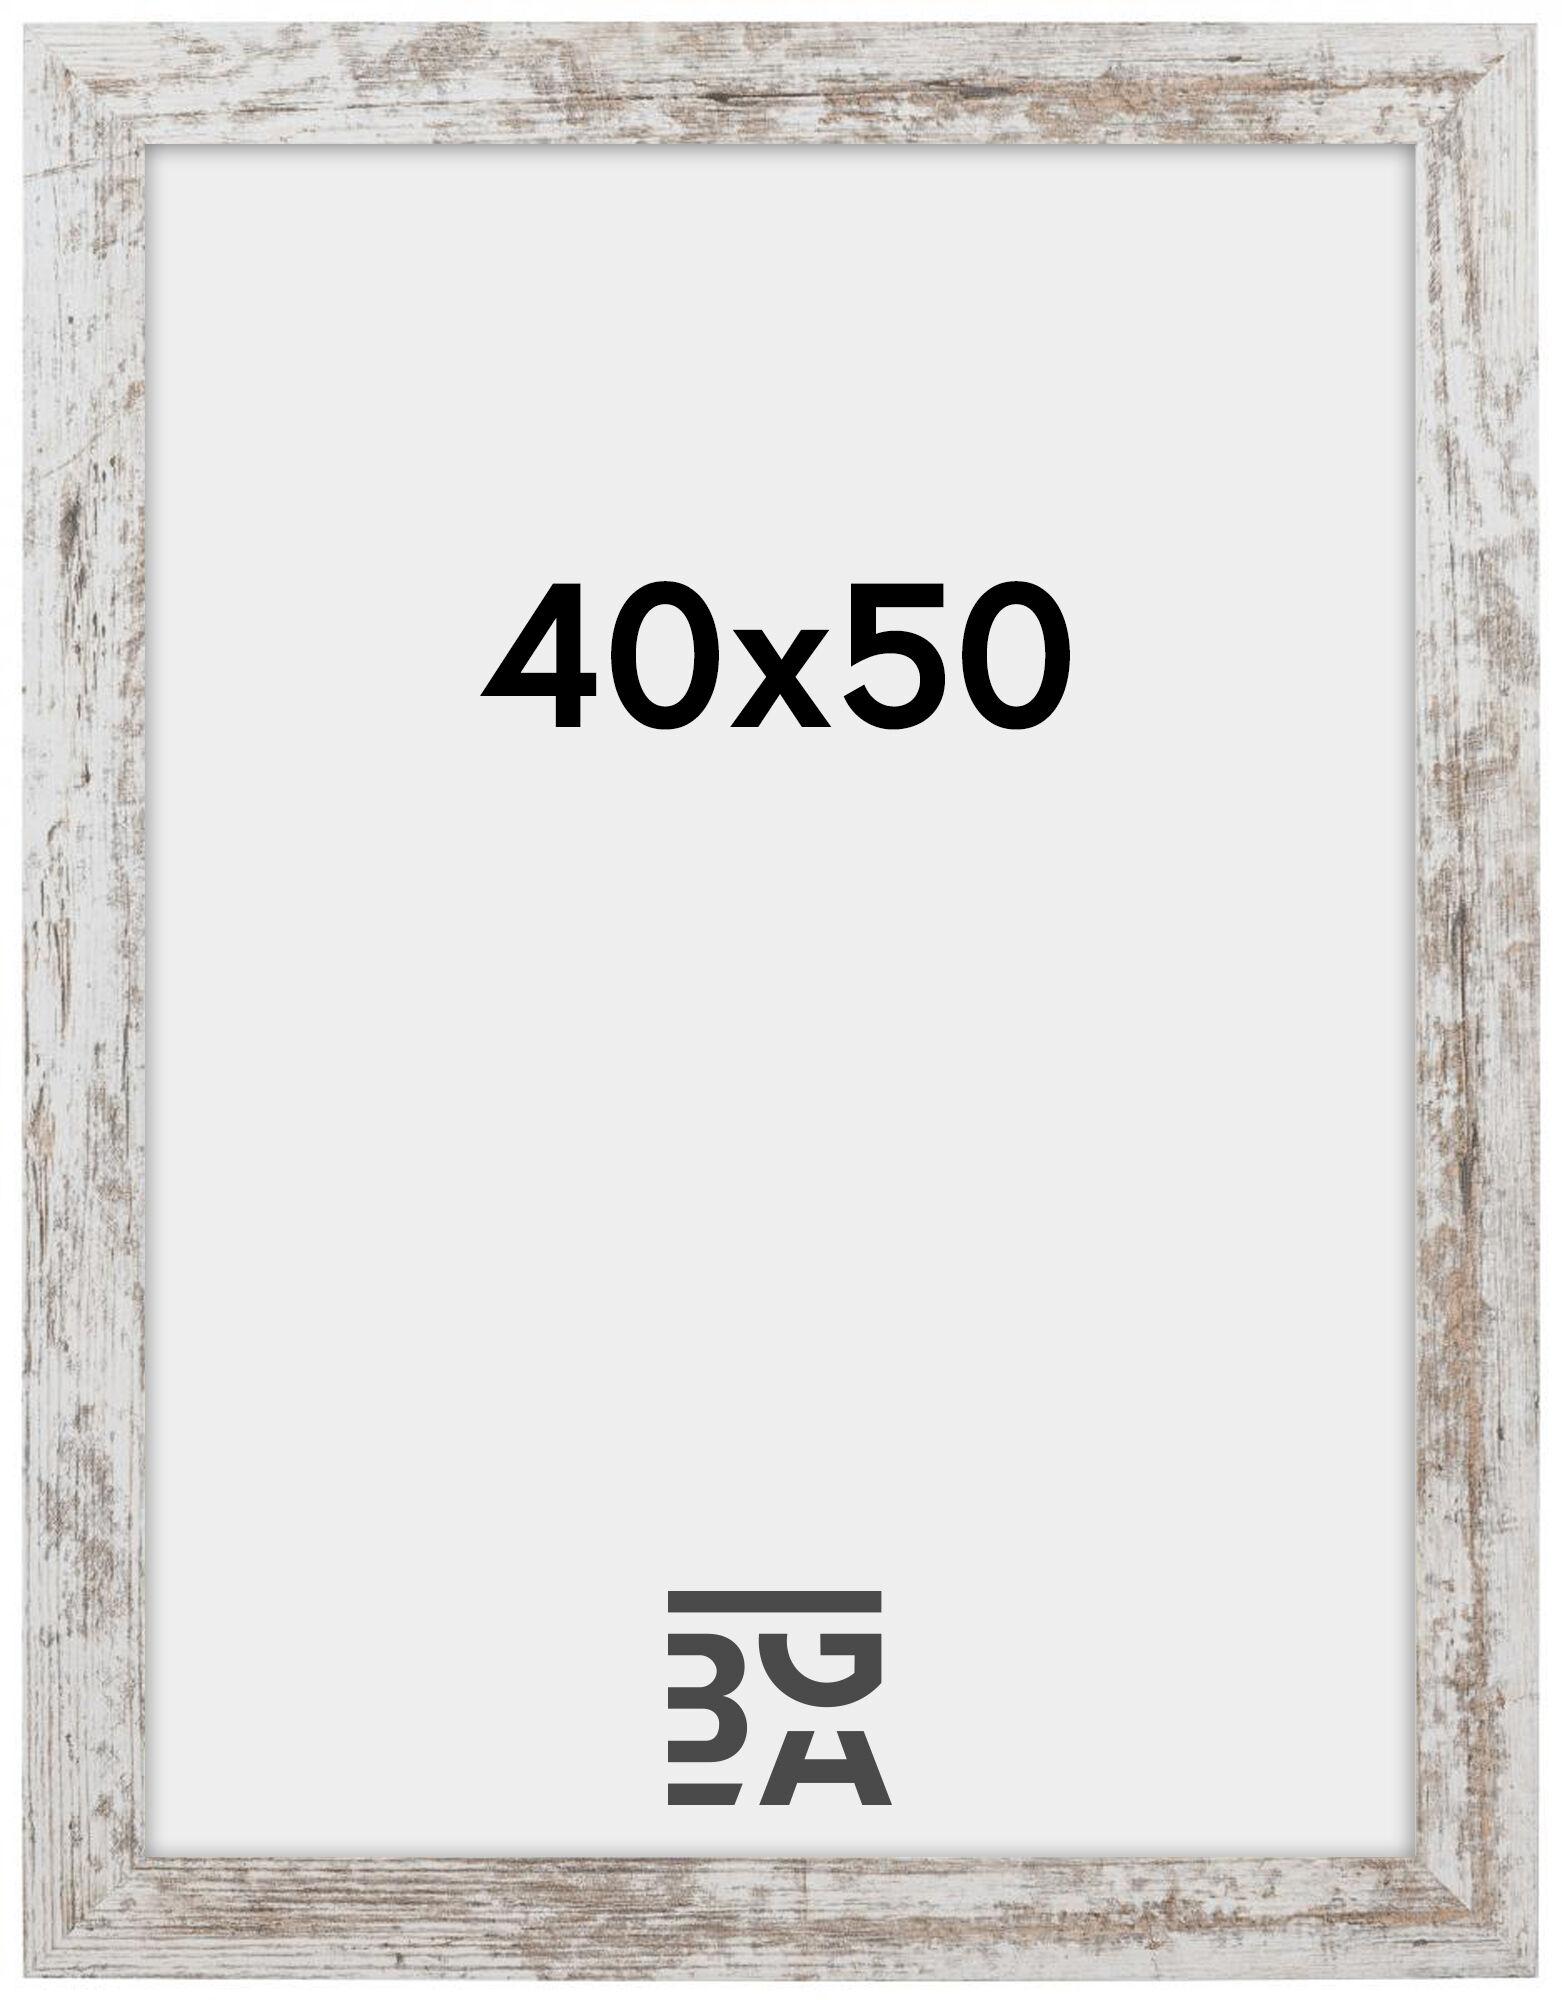 Estancia Superb AA 40x50 cm